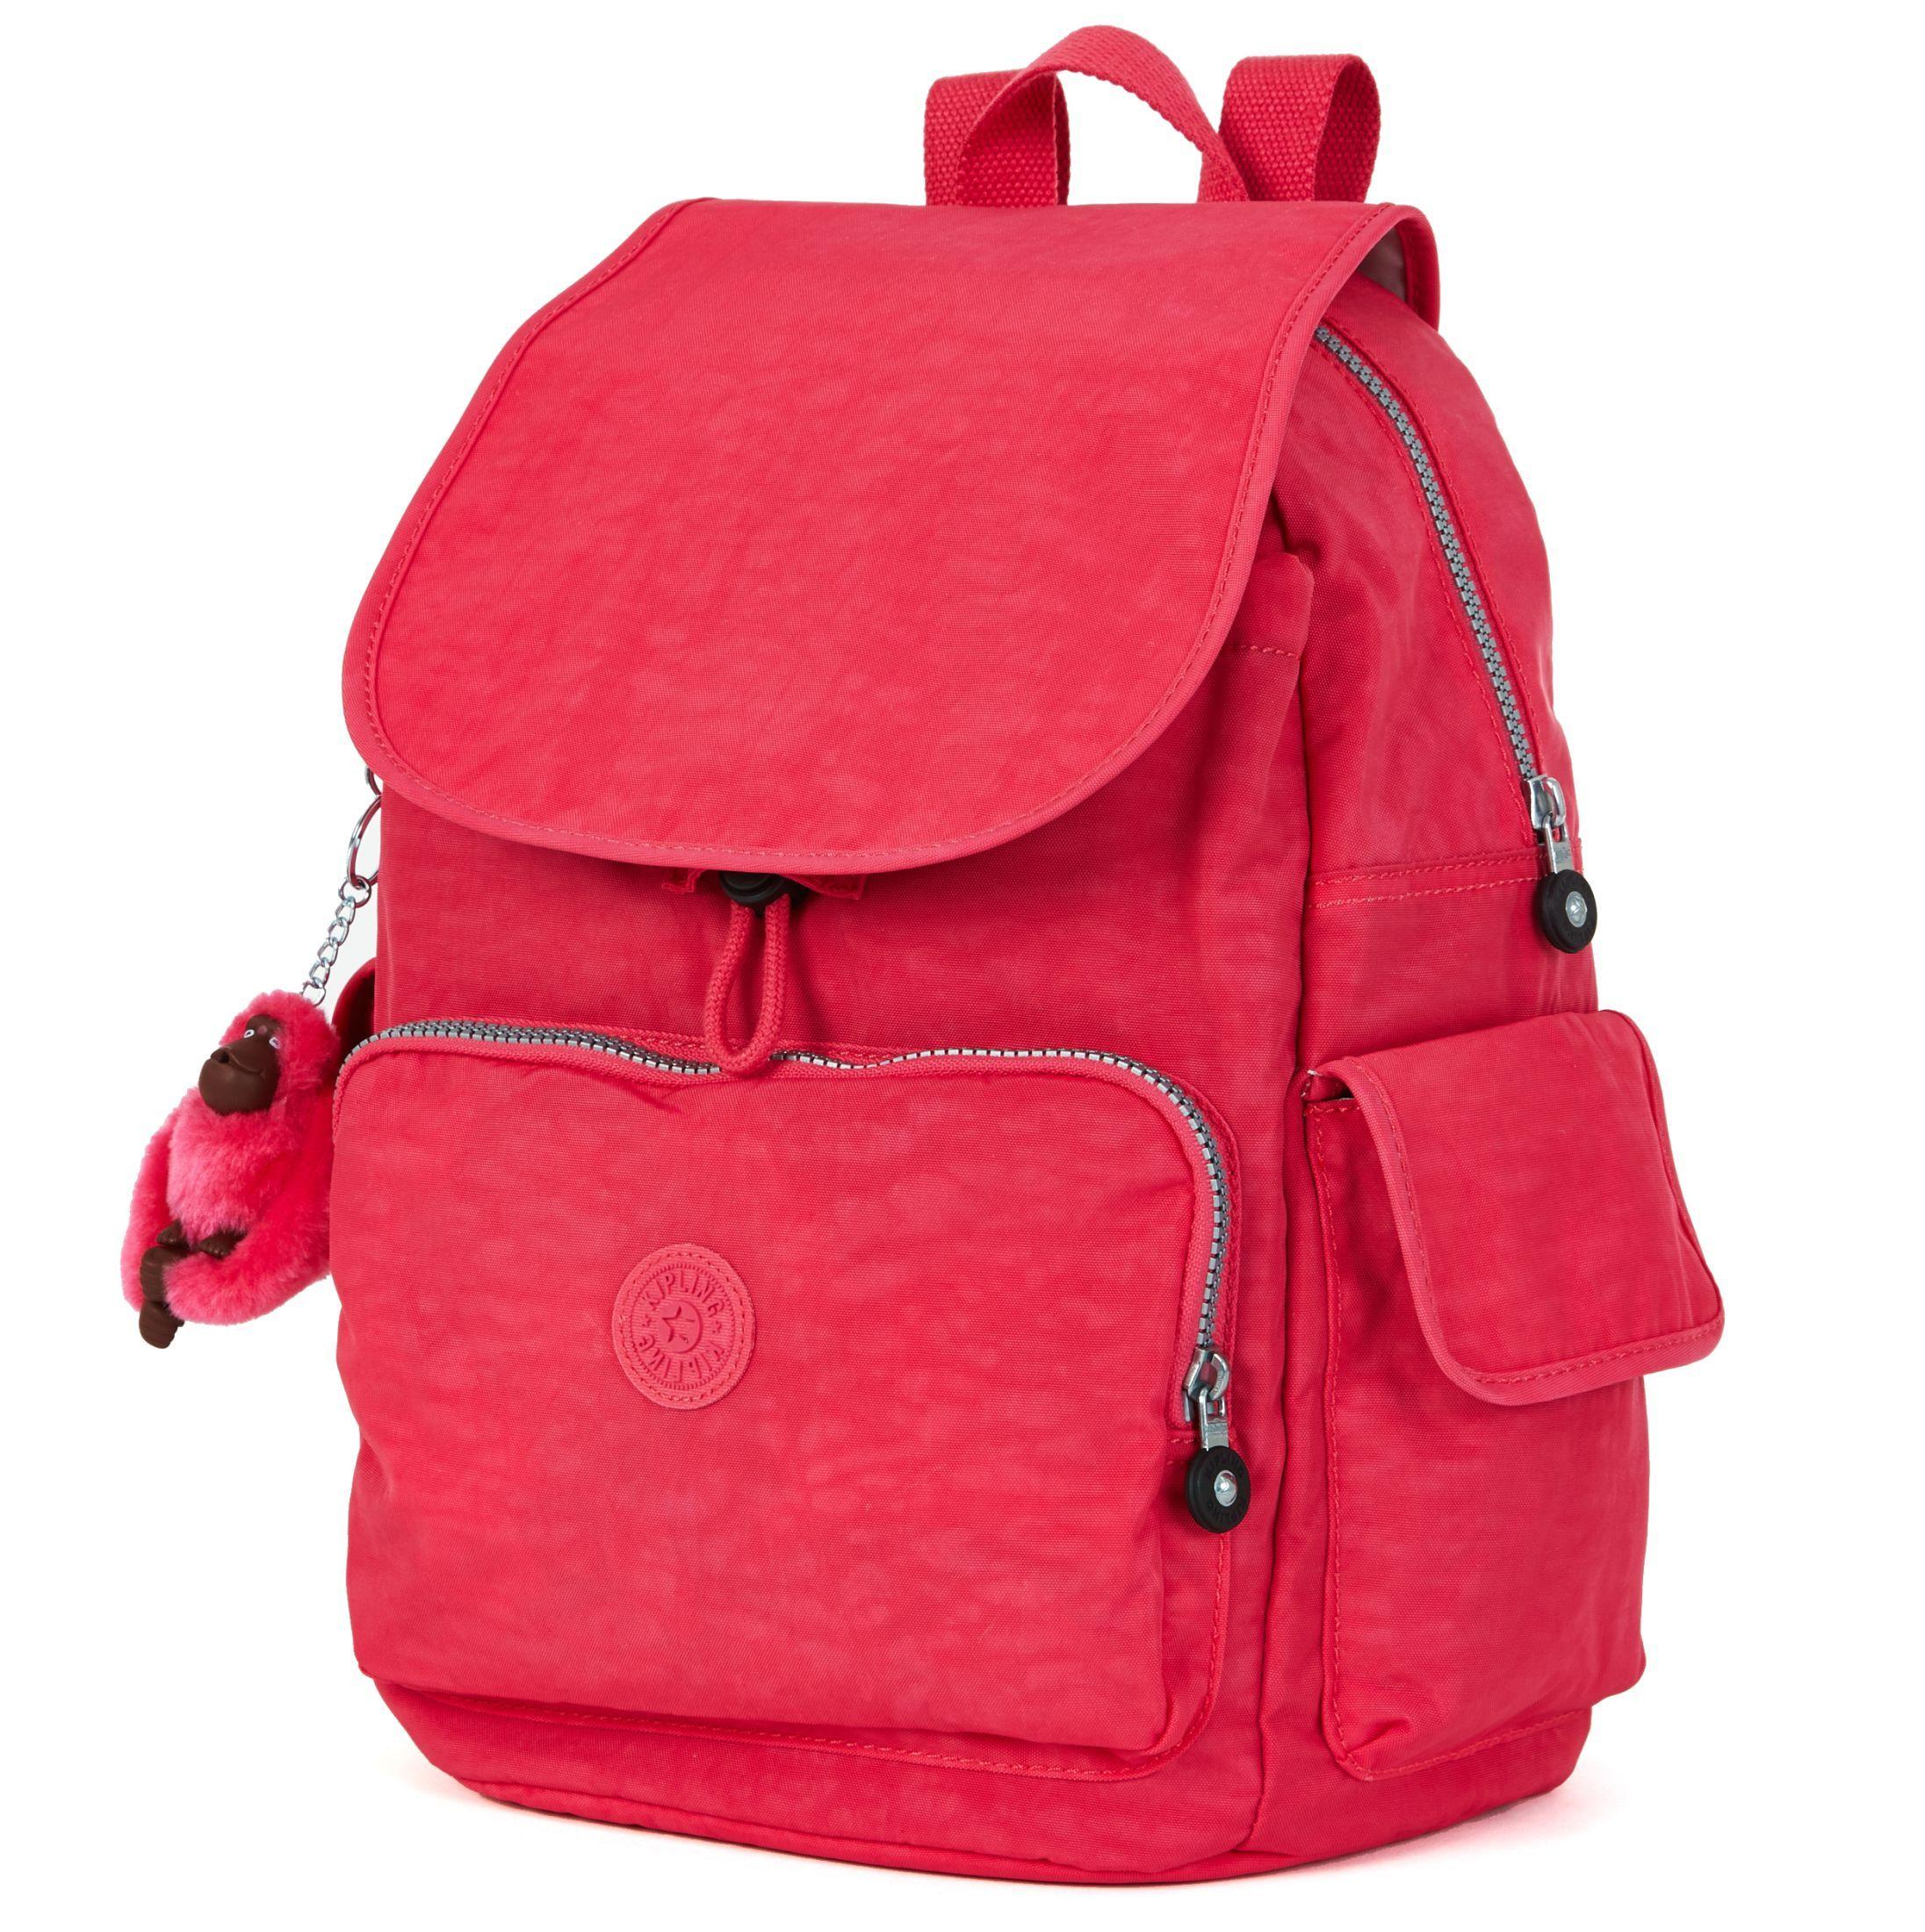 Ravier Medium Backpack | Mochila kipling, Bolsas kipling e